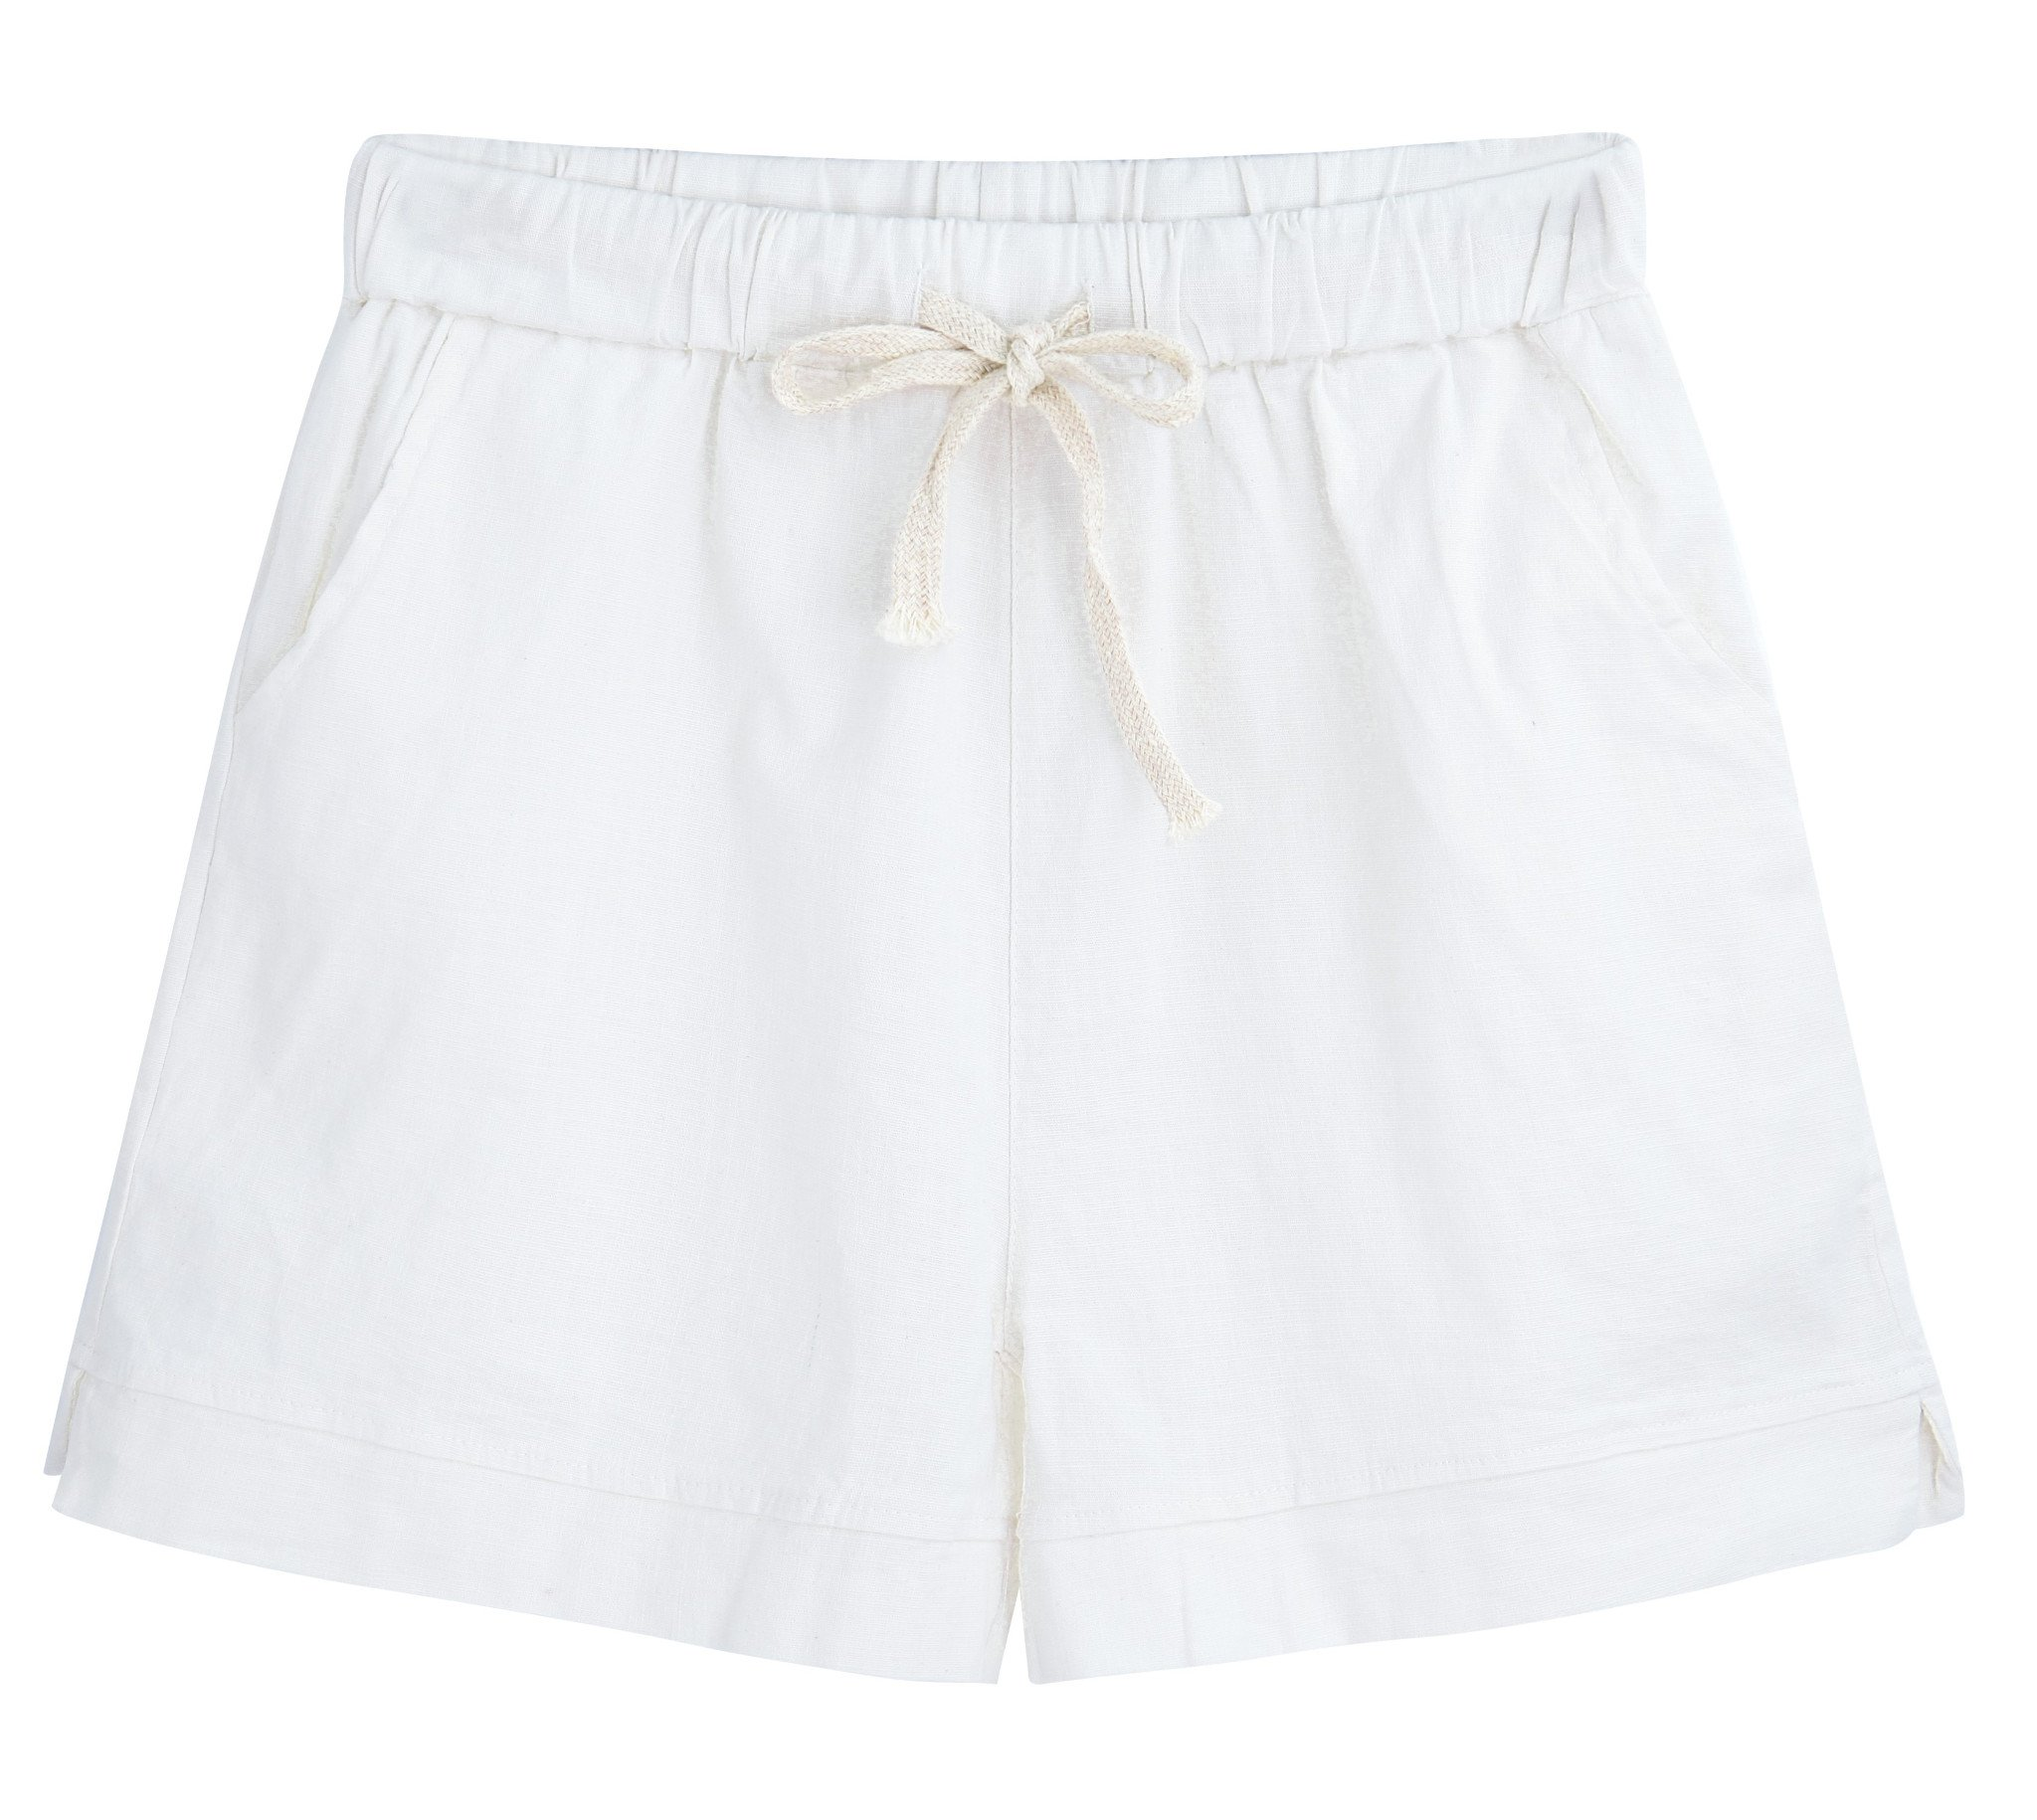 Yknktstc Womens Elastic Waist Cotton Linen Casual Beach Shorts with Drawstring US 12 Style 2 White